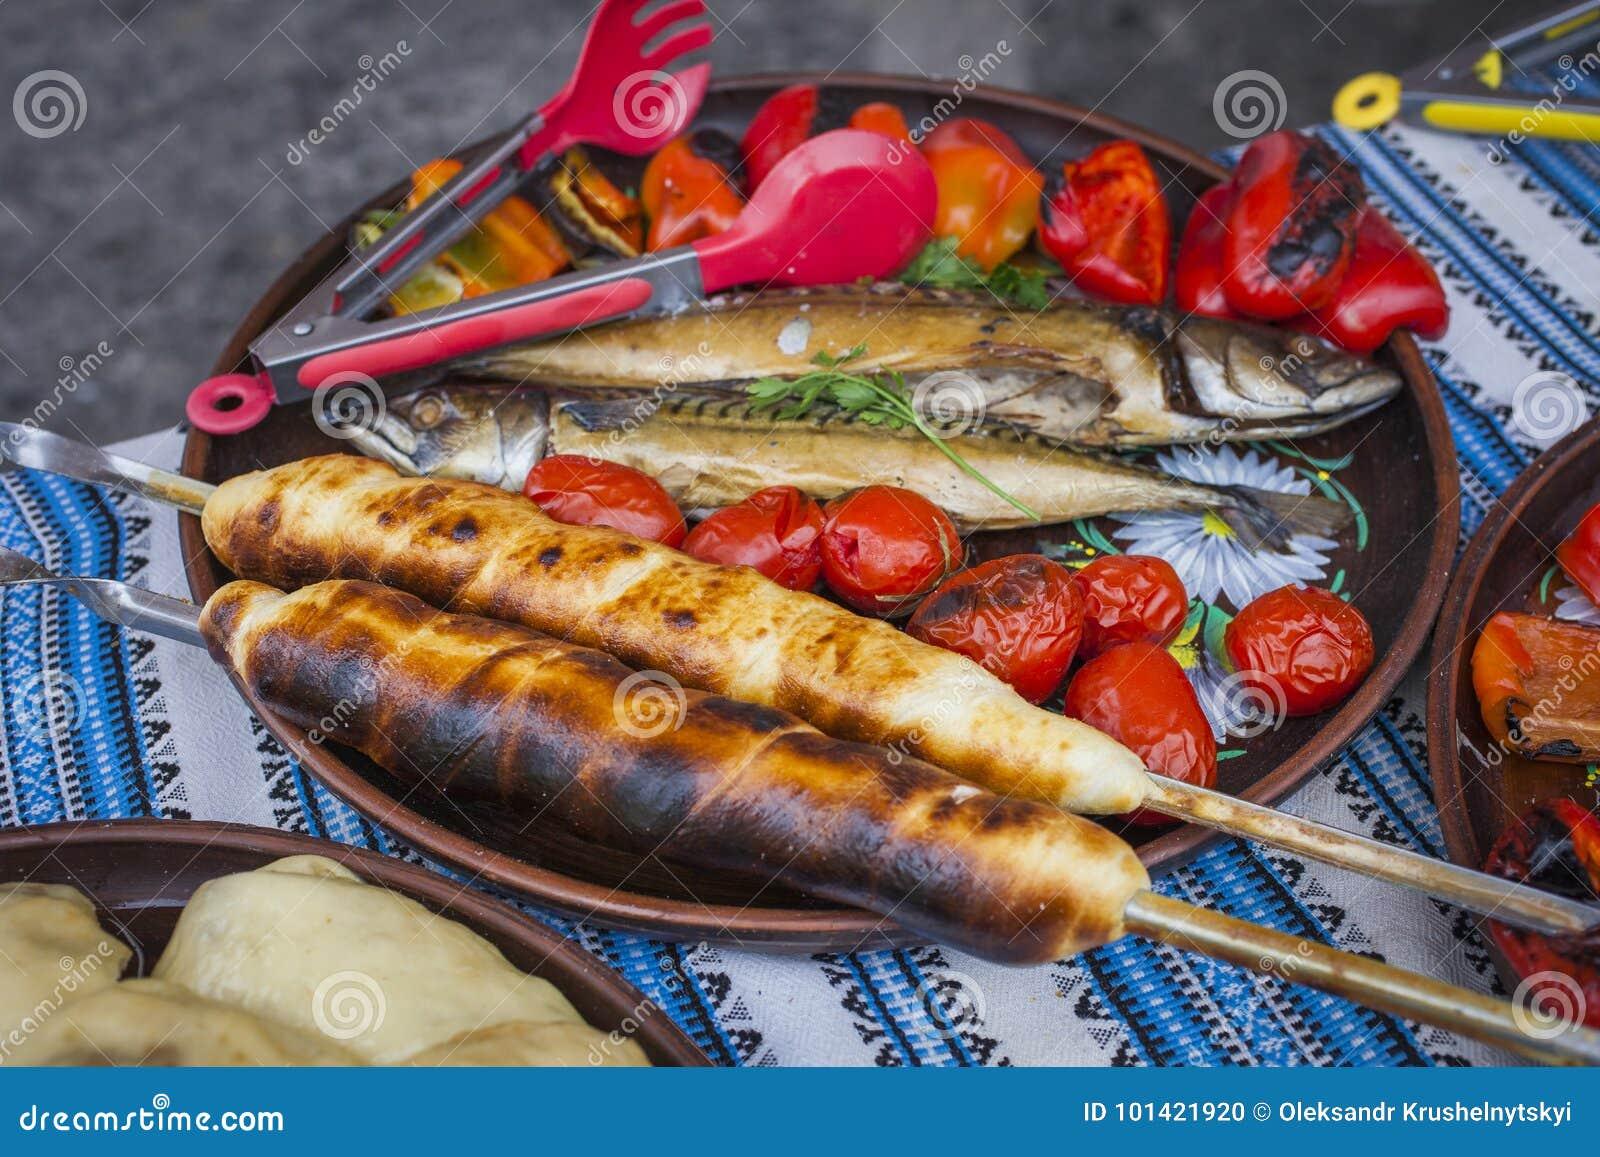 Georgian traditional dish - khachapuri, pastry with cheese tomatoes